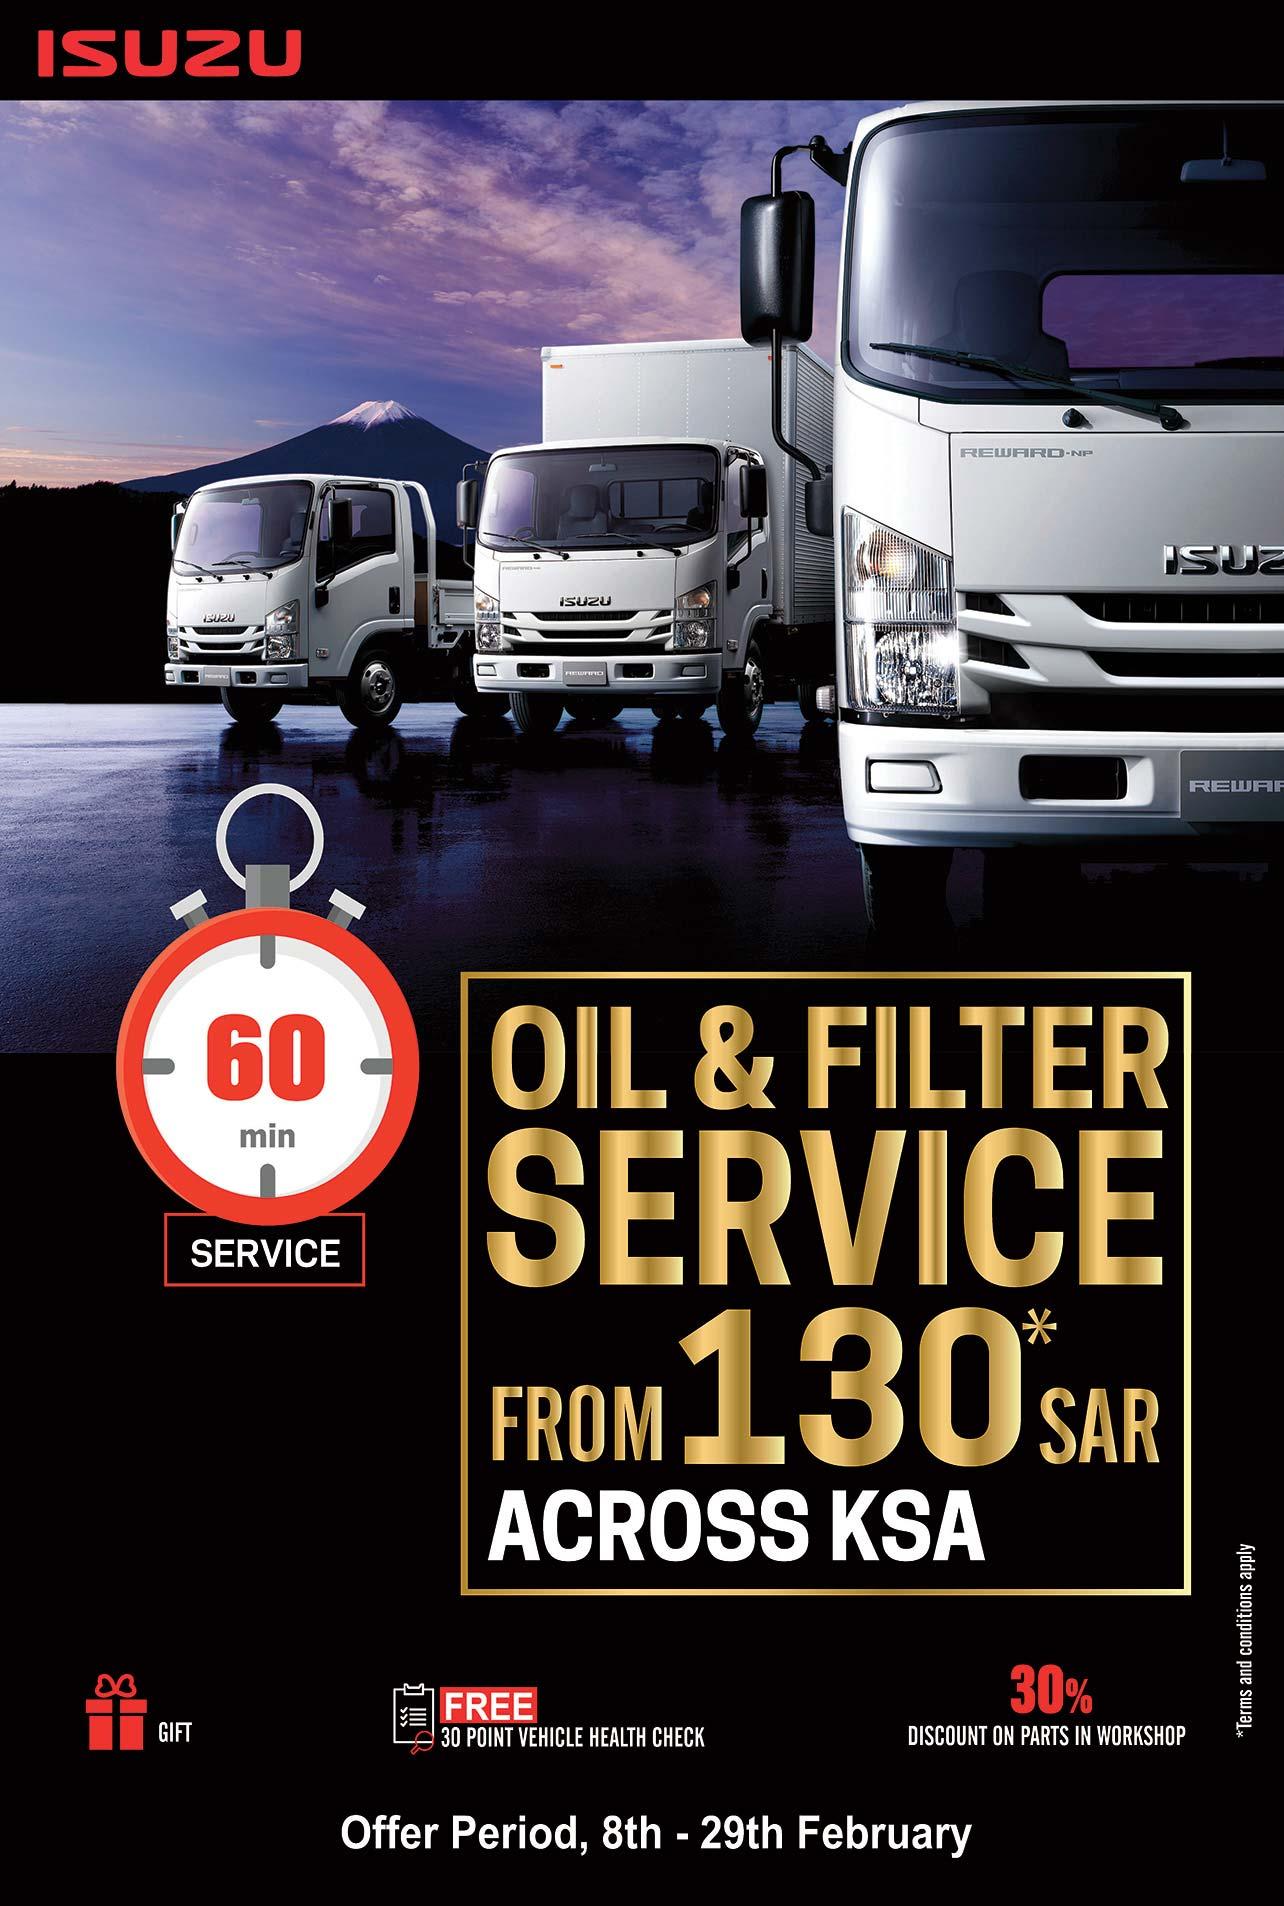 Isuzu 60 min Service with Competitive Price in KSA - English Banner